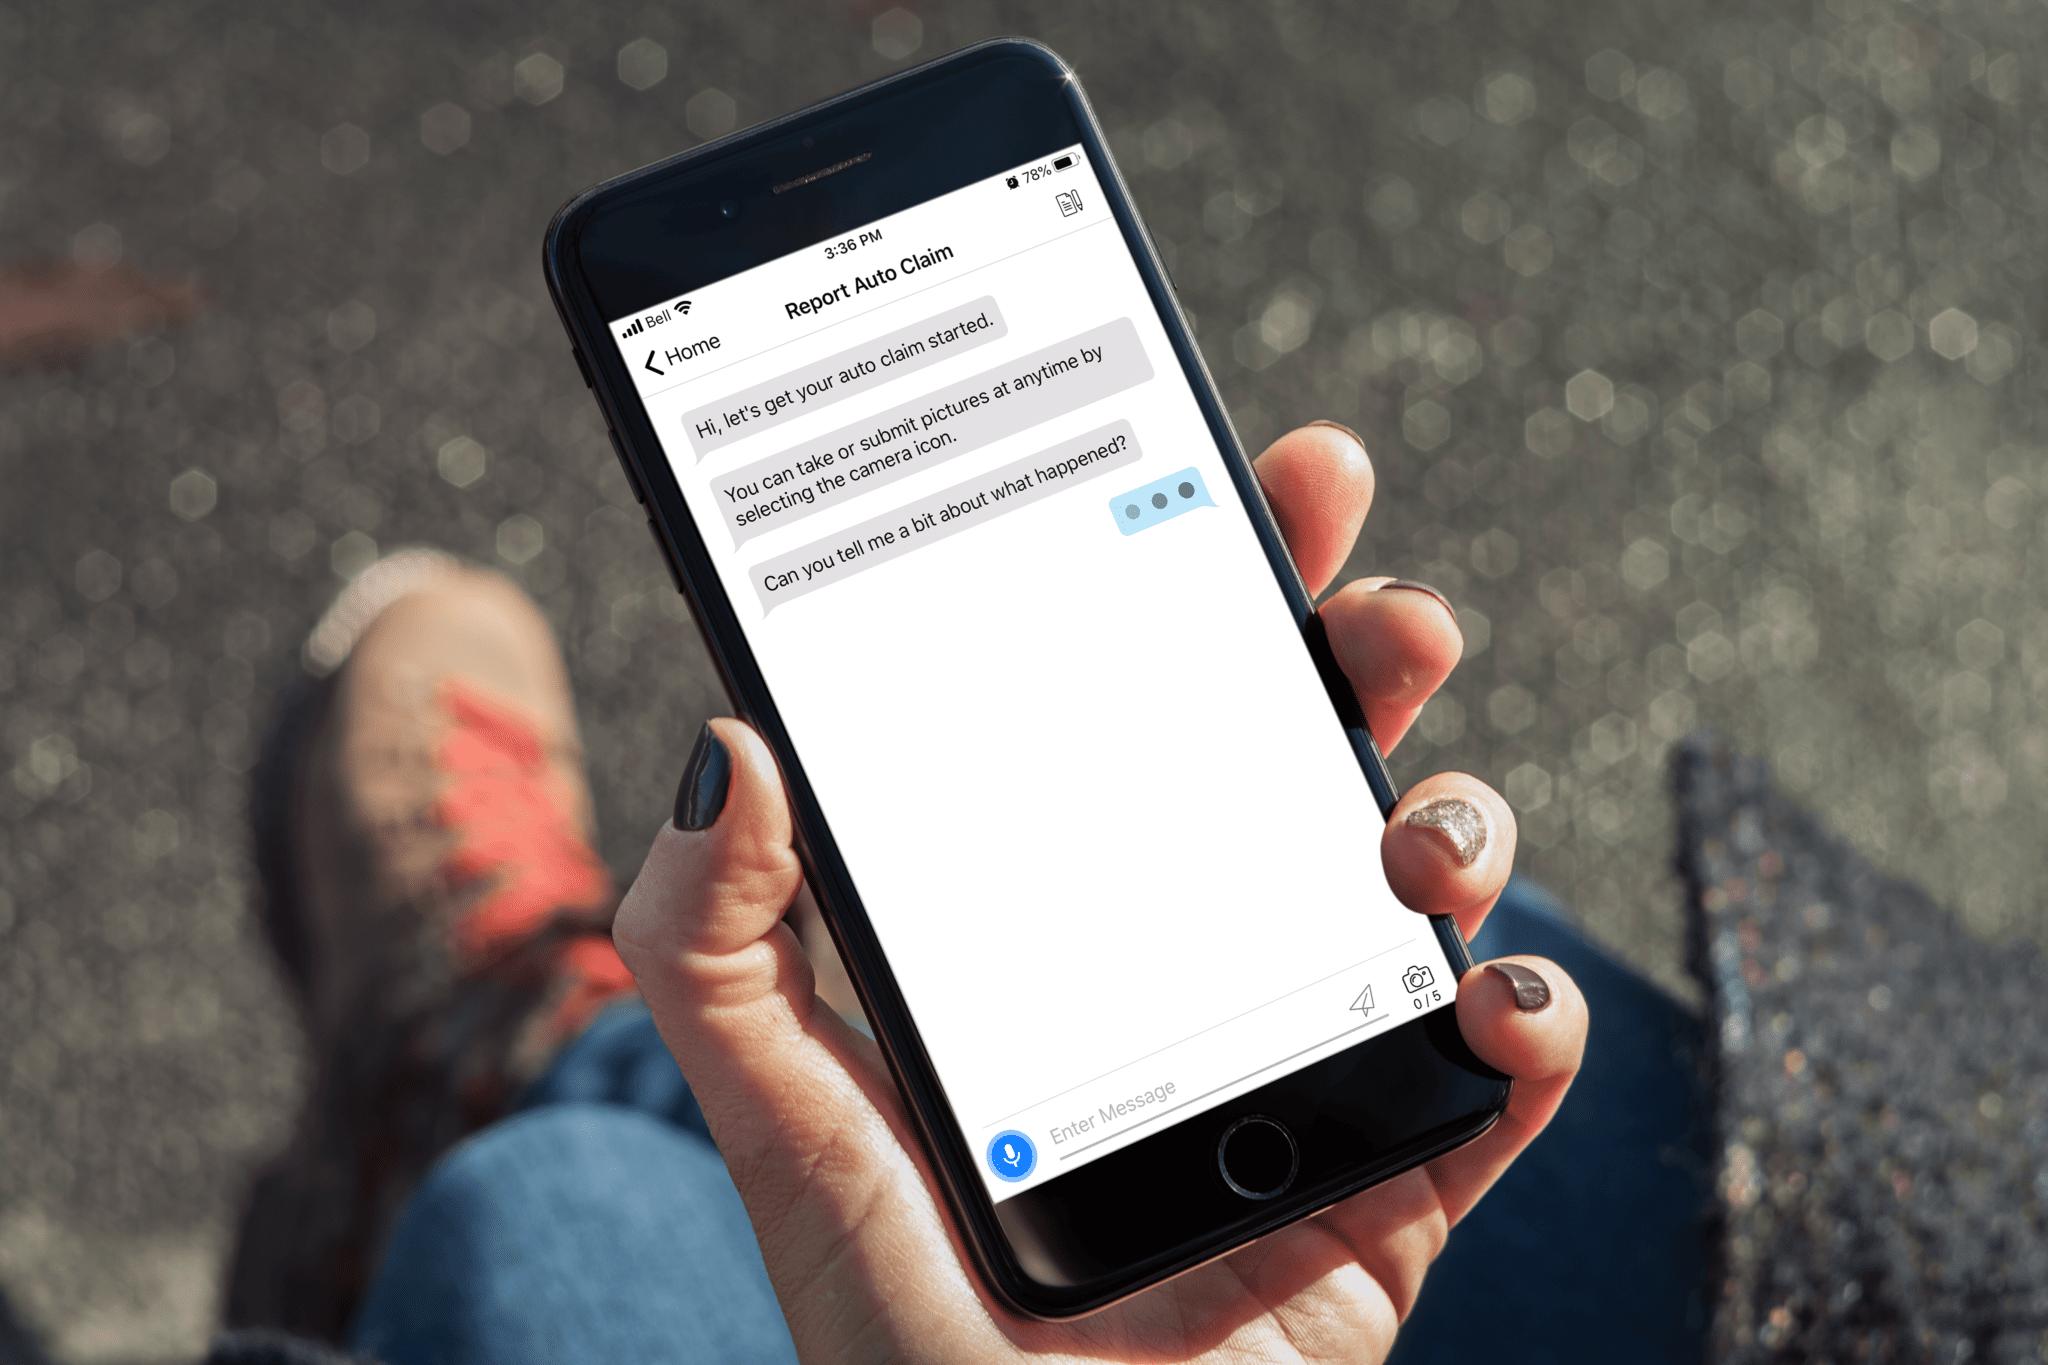 W/24 App Claim Chat Bot